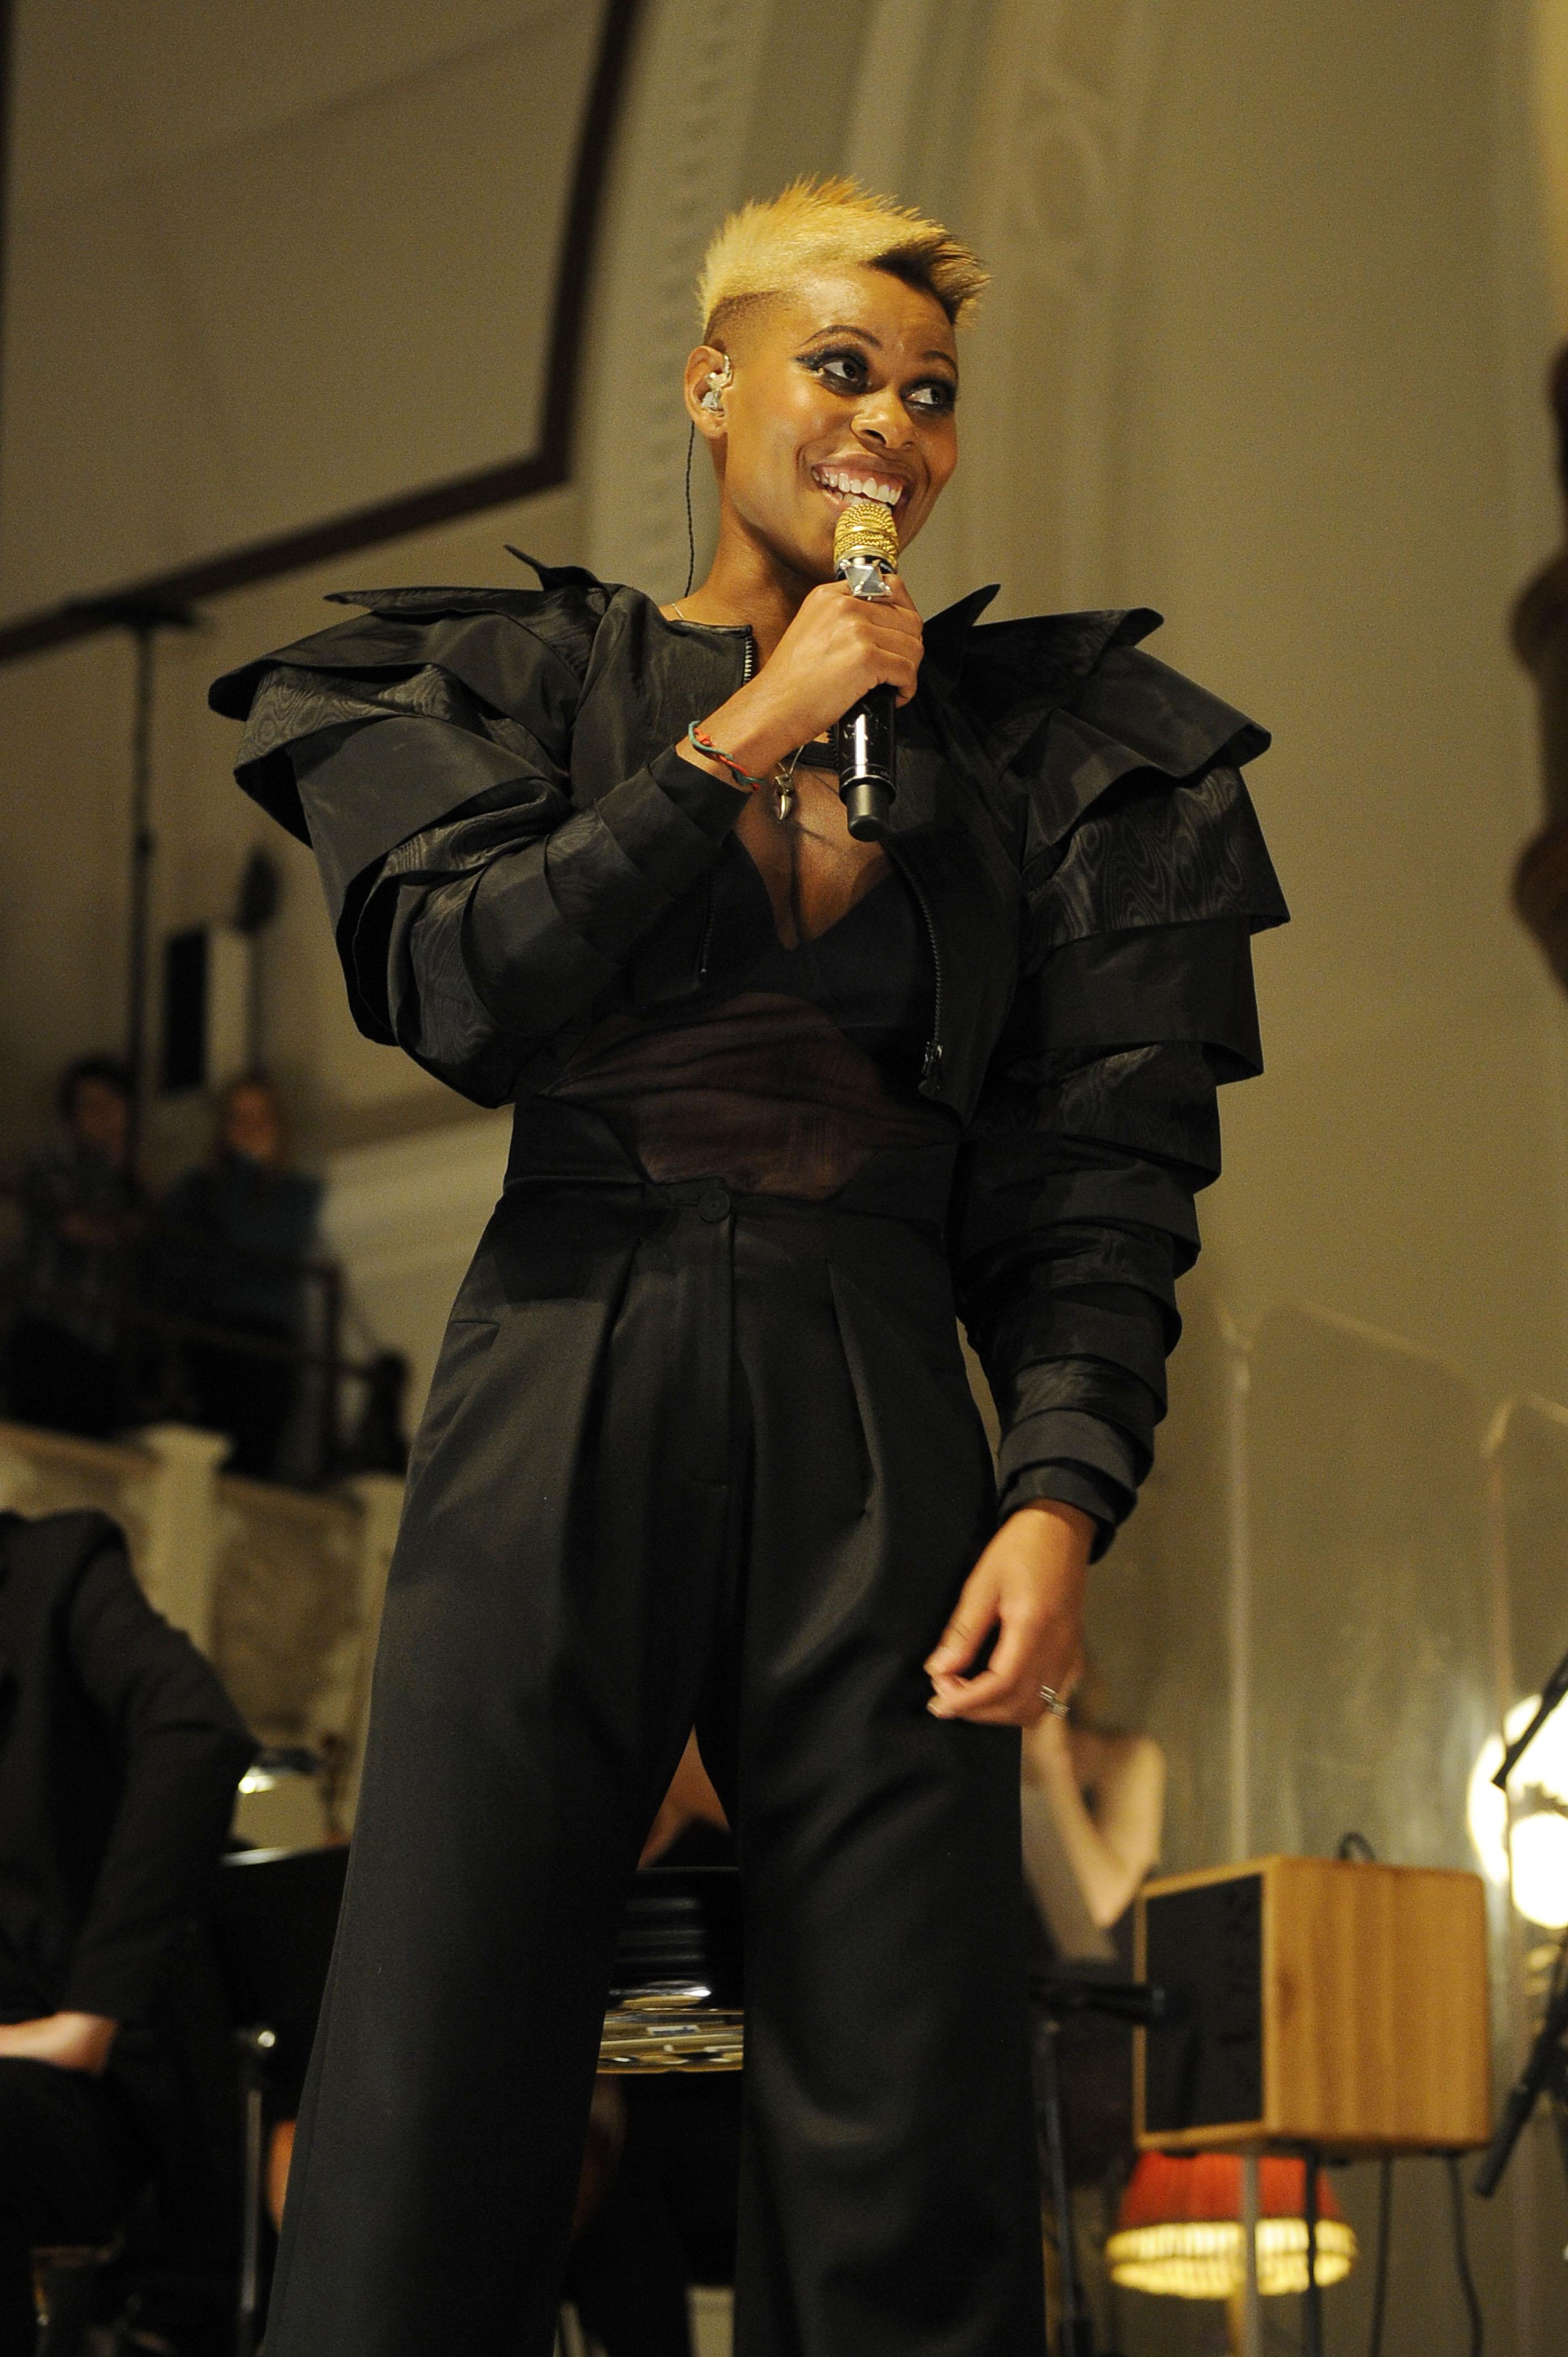 Skunk Anansie live, Ivana Pilja outfit